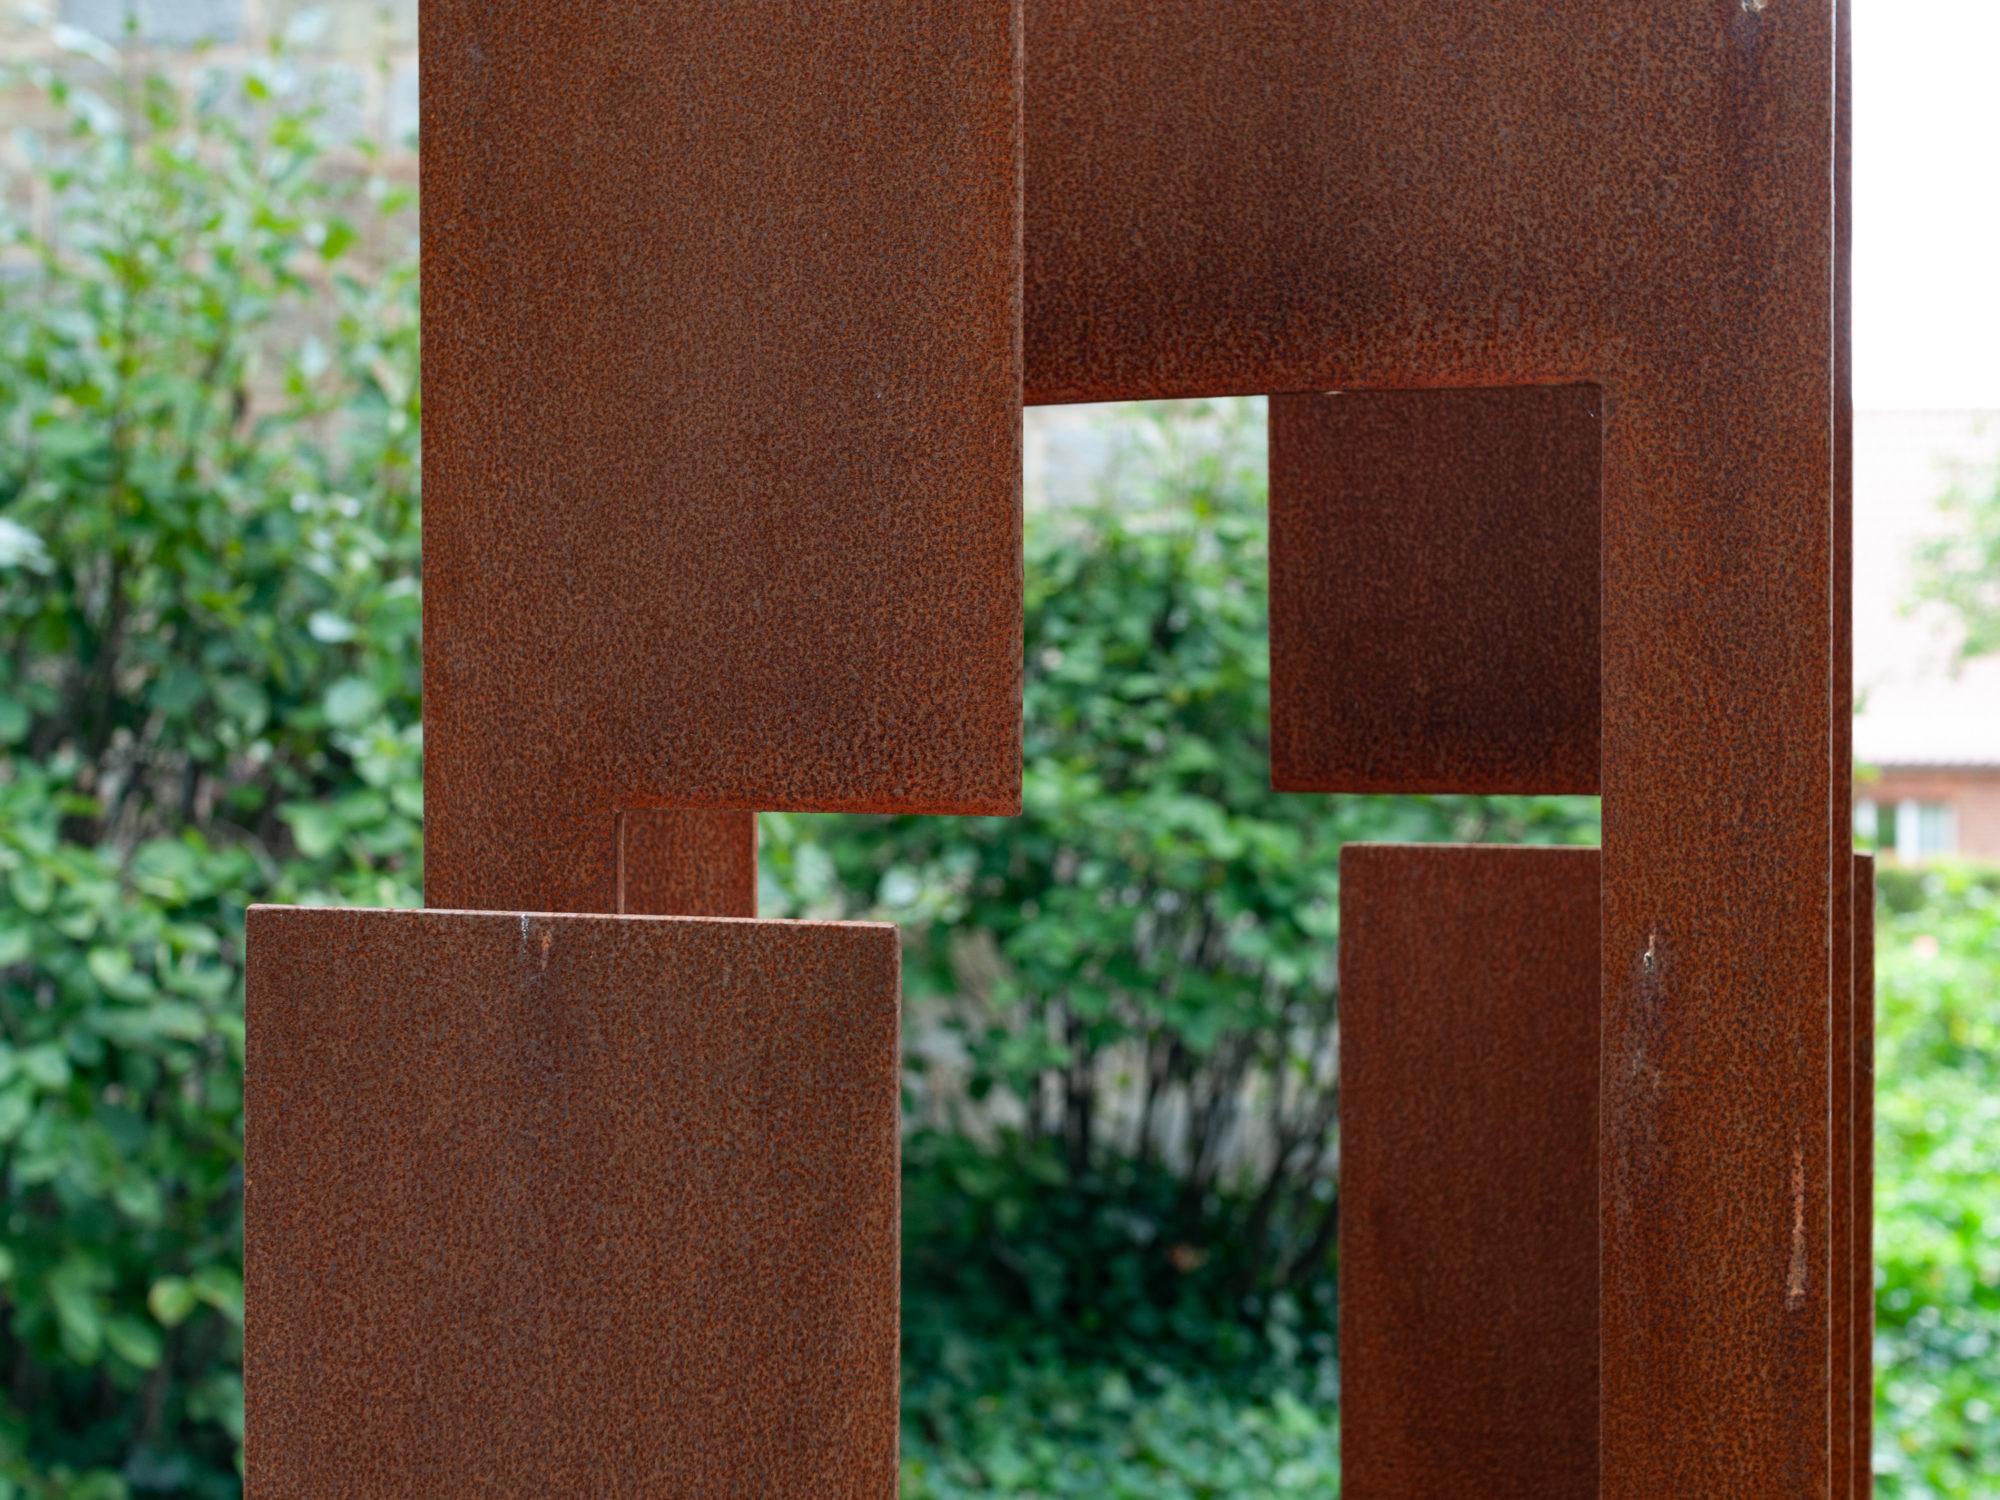 Skulptur kfd Lünne